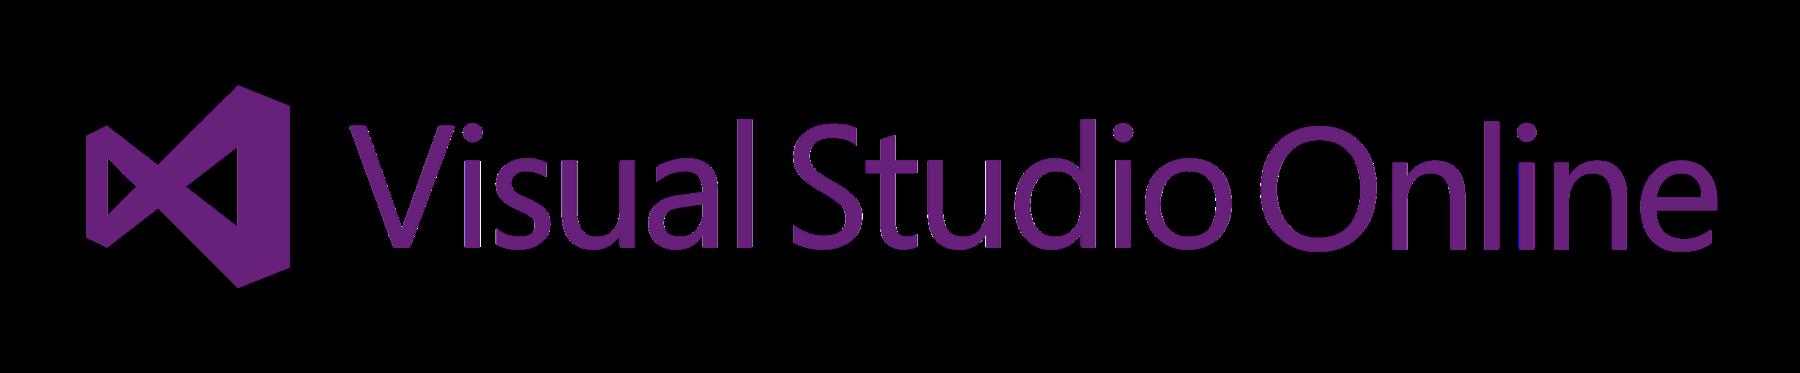 Visual Studio Online Logo